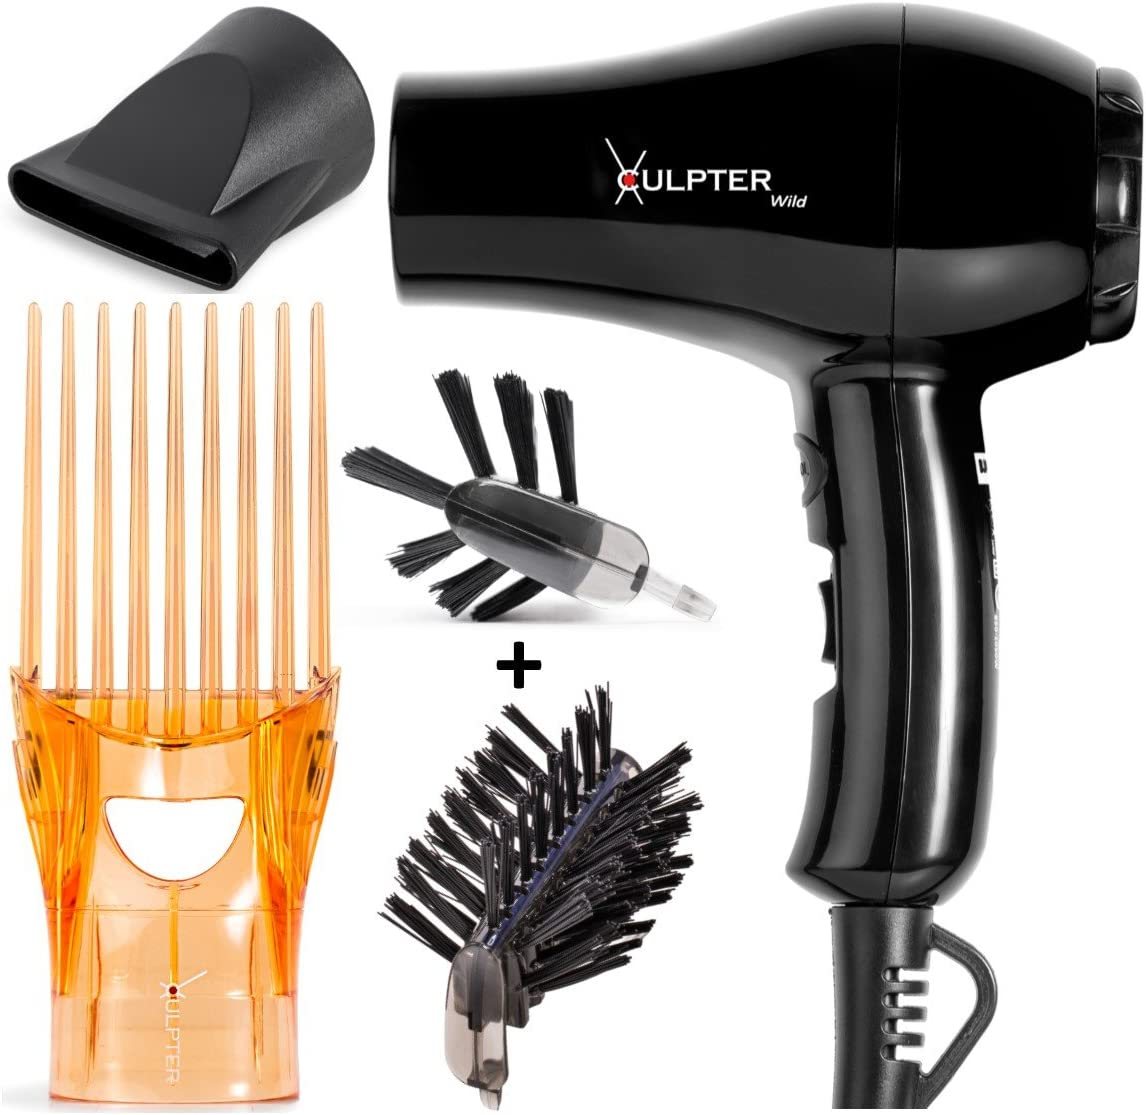 Xculpter Wild Asciugacapelli Lisciante 2 spazzole Sun